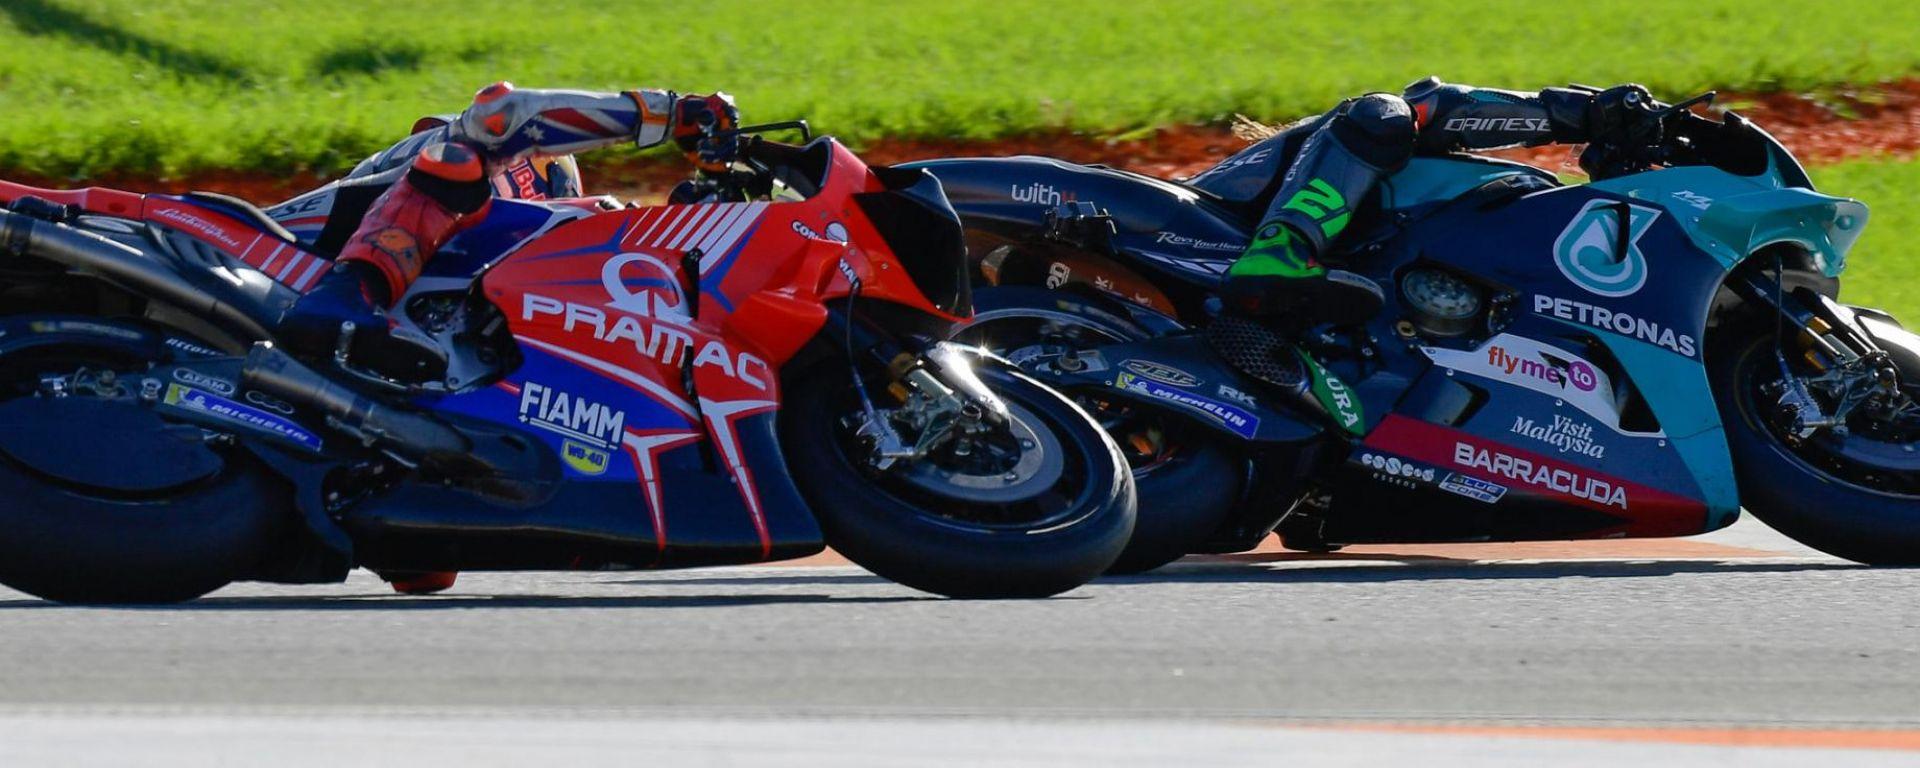 Jack Miller (Ducati Pramac) e Franco Morbidelli (Yamaha Petronas)